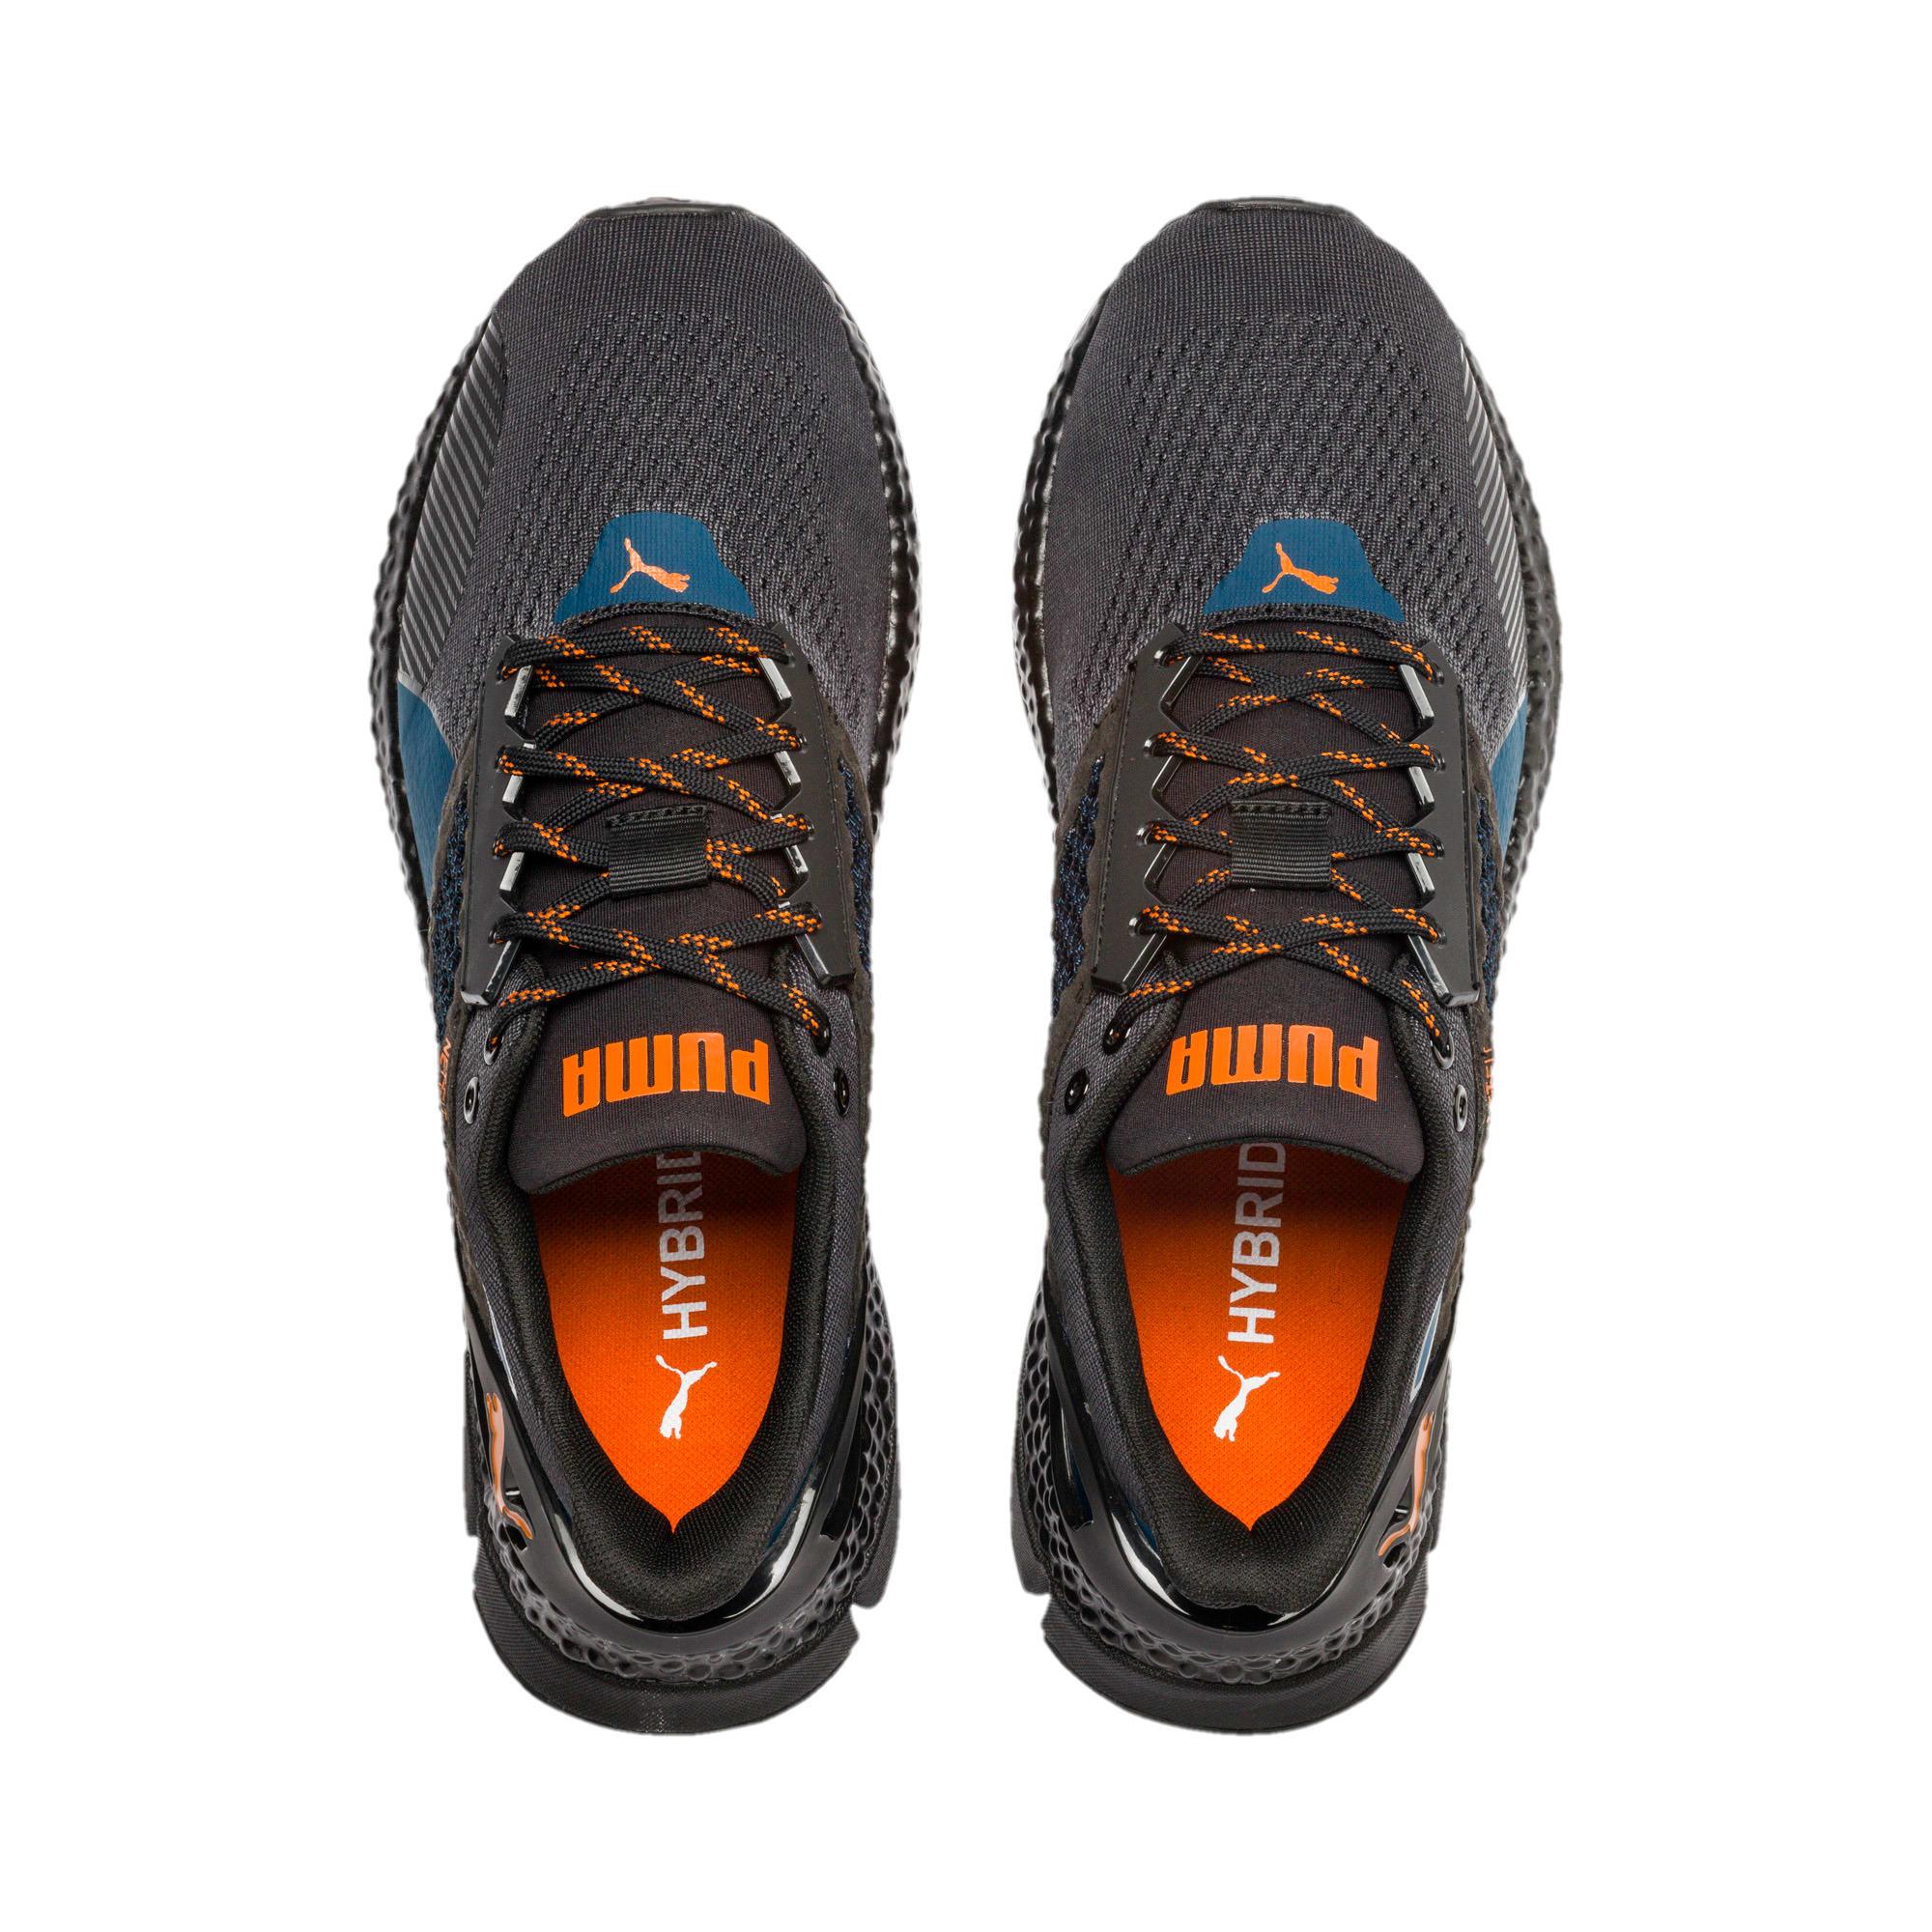 Imagen en miniatura 8 de Zapatillas de running de hombre HYBRID NETFIT Astro, Gibraltar Sea-Puma Black, mediana